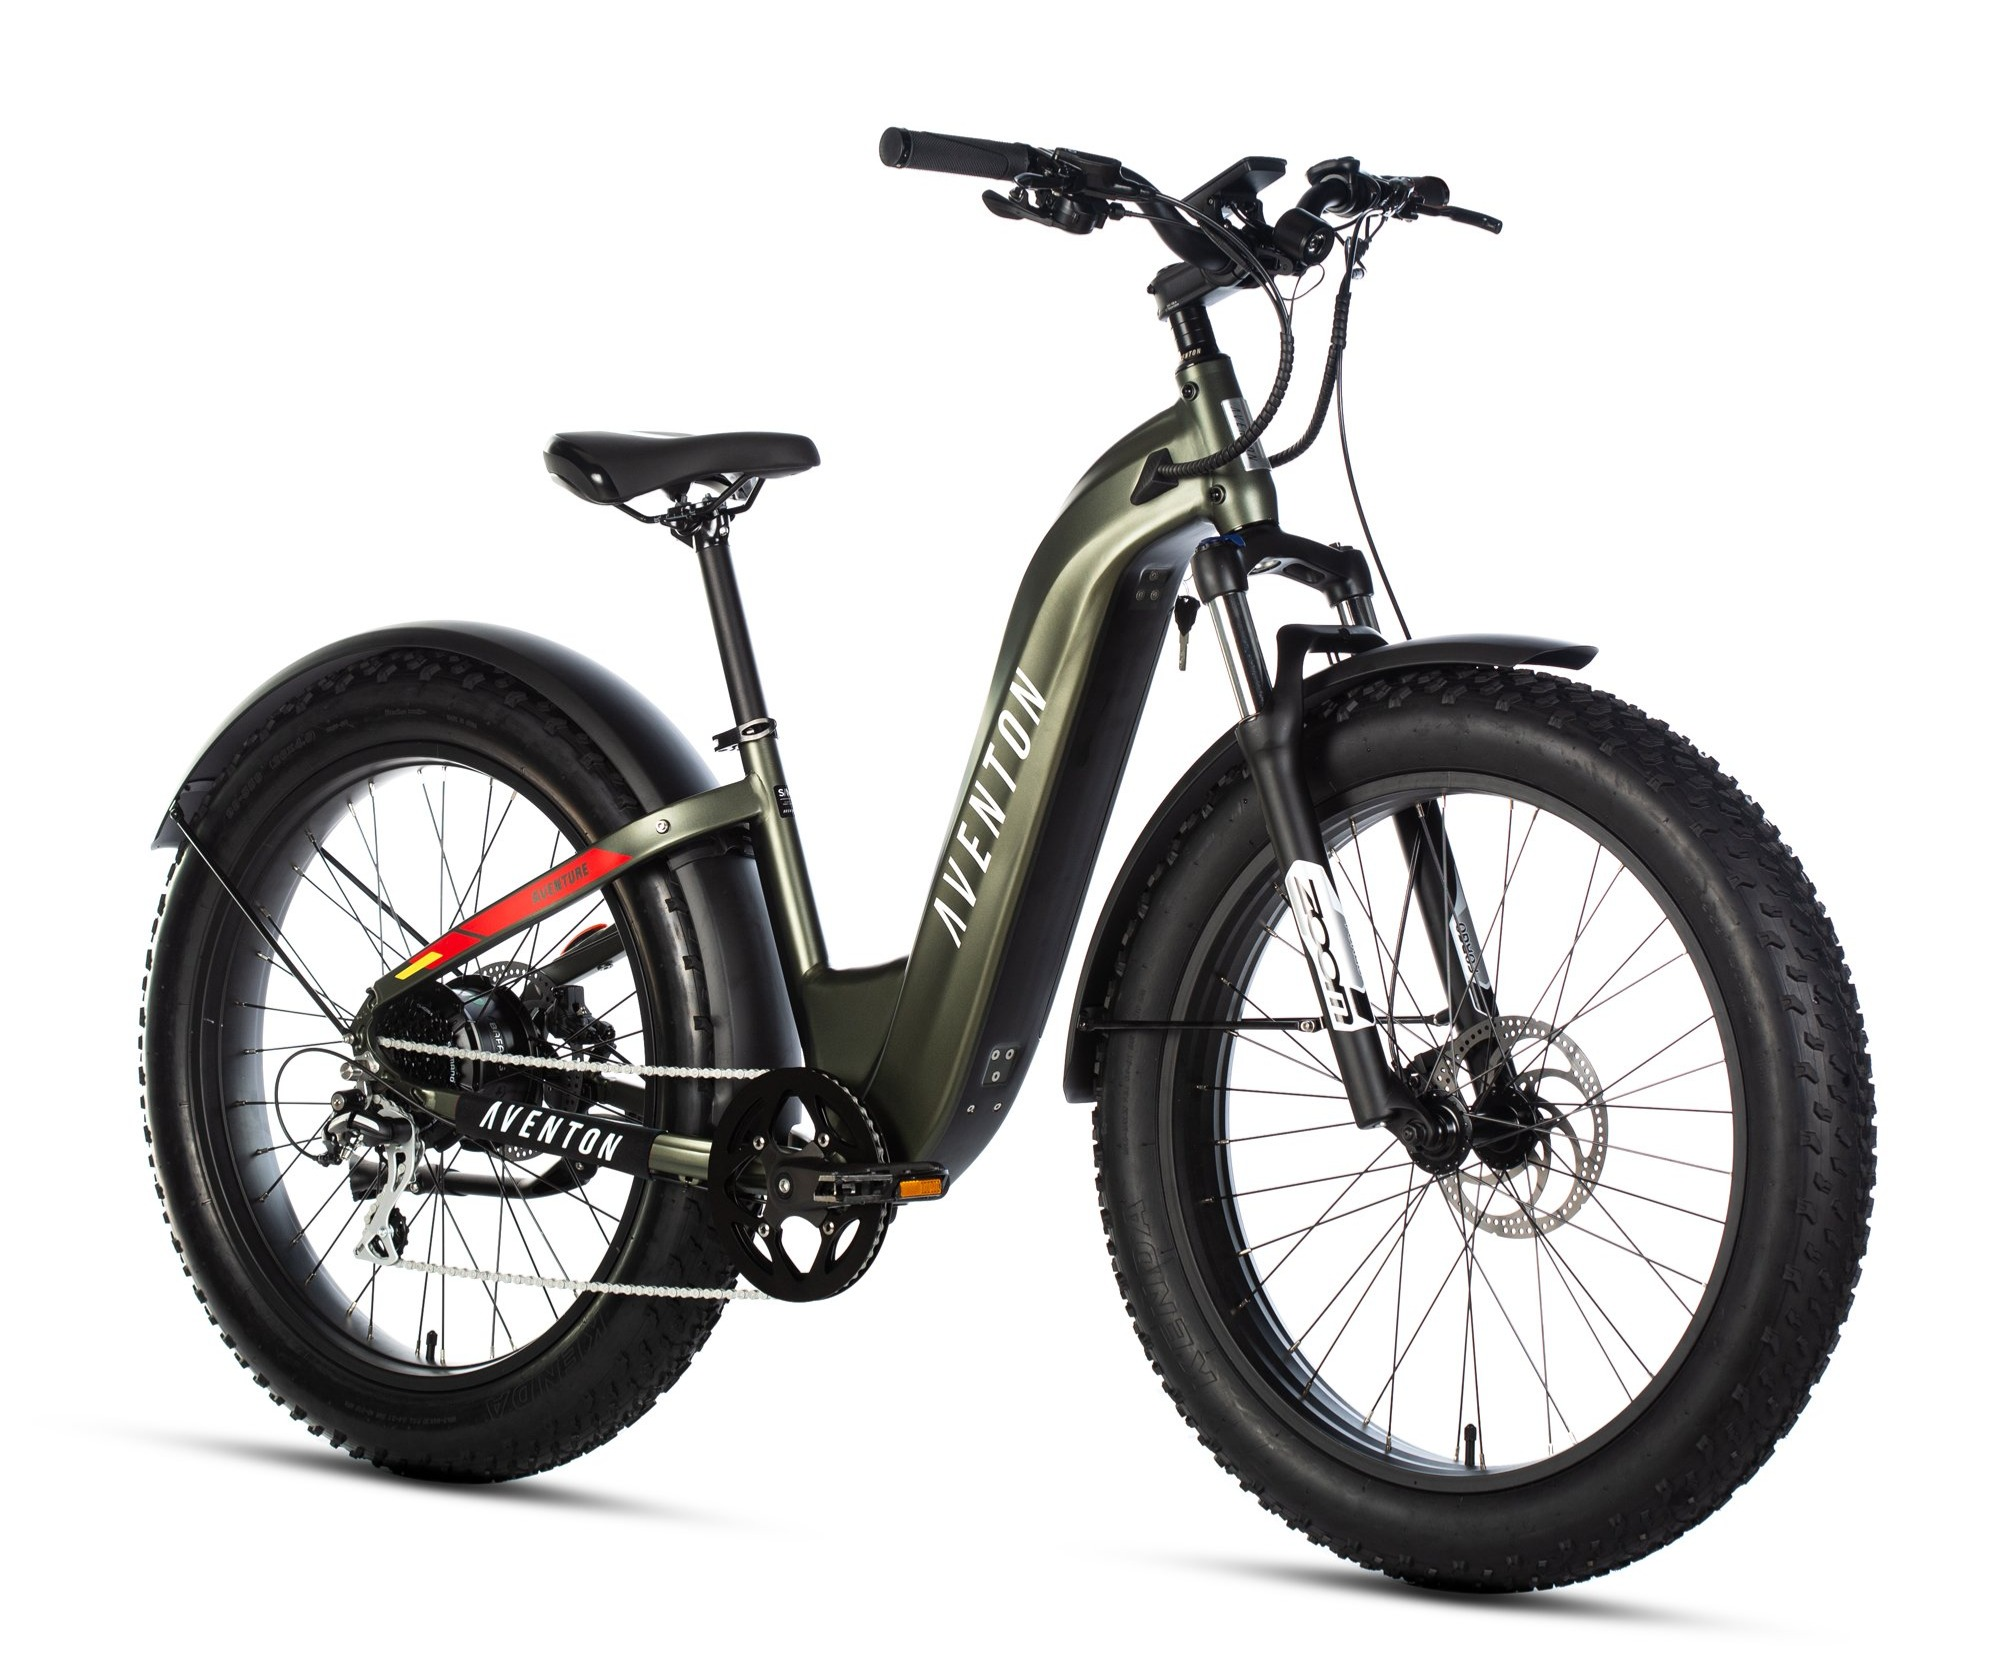 Aventon E-bikes, Adventure step-through model